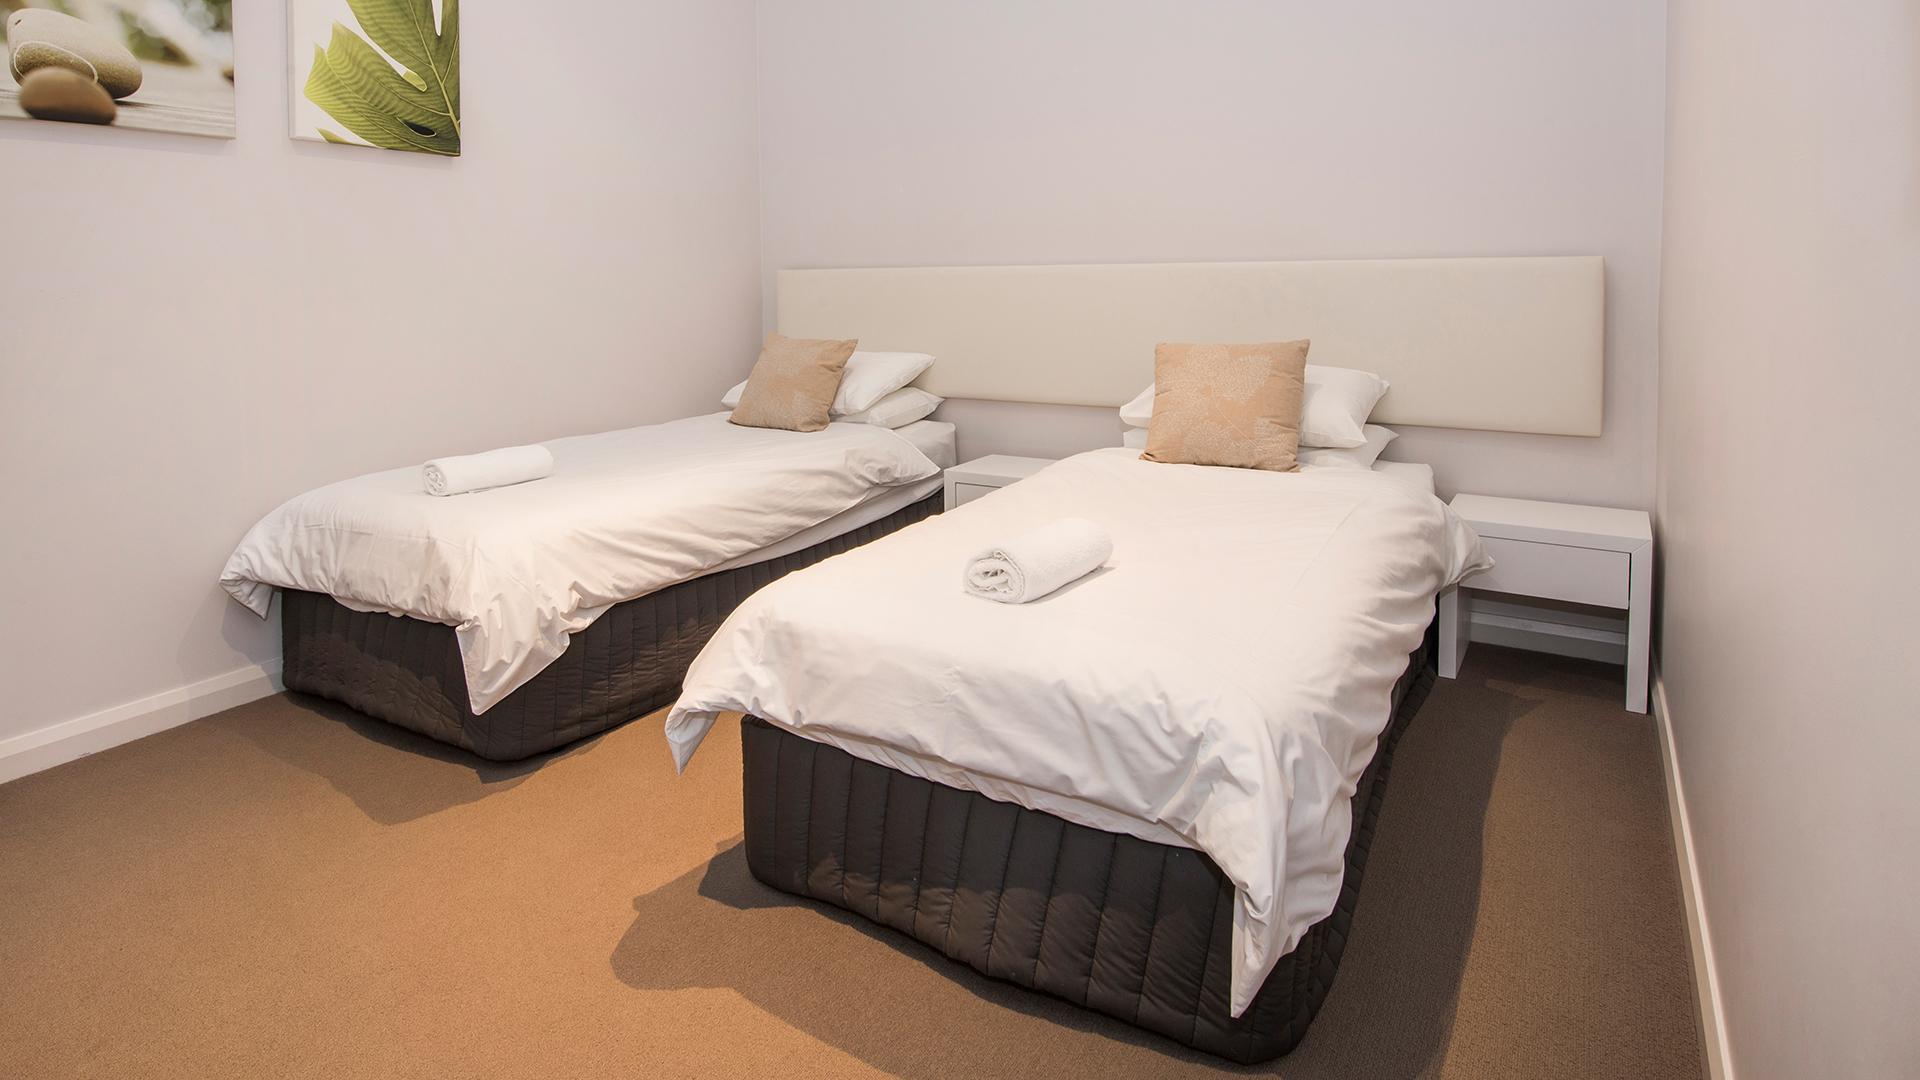 One Bedroom Grove House image 1 at The Aqua Resort Busselton by City of Busselton, Western Australia, Australia